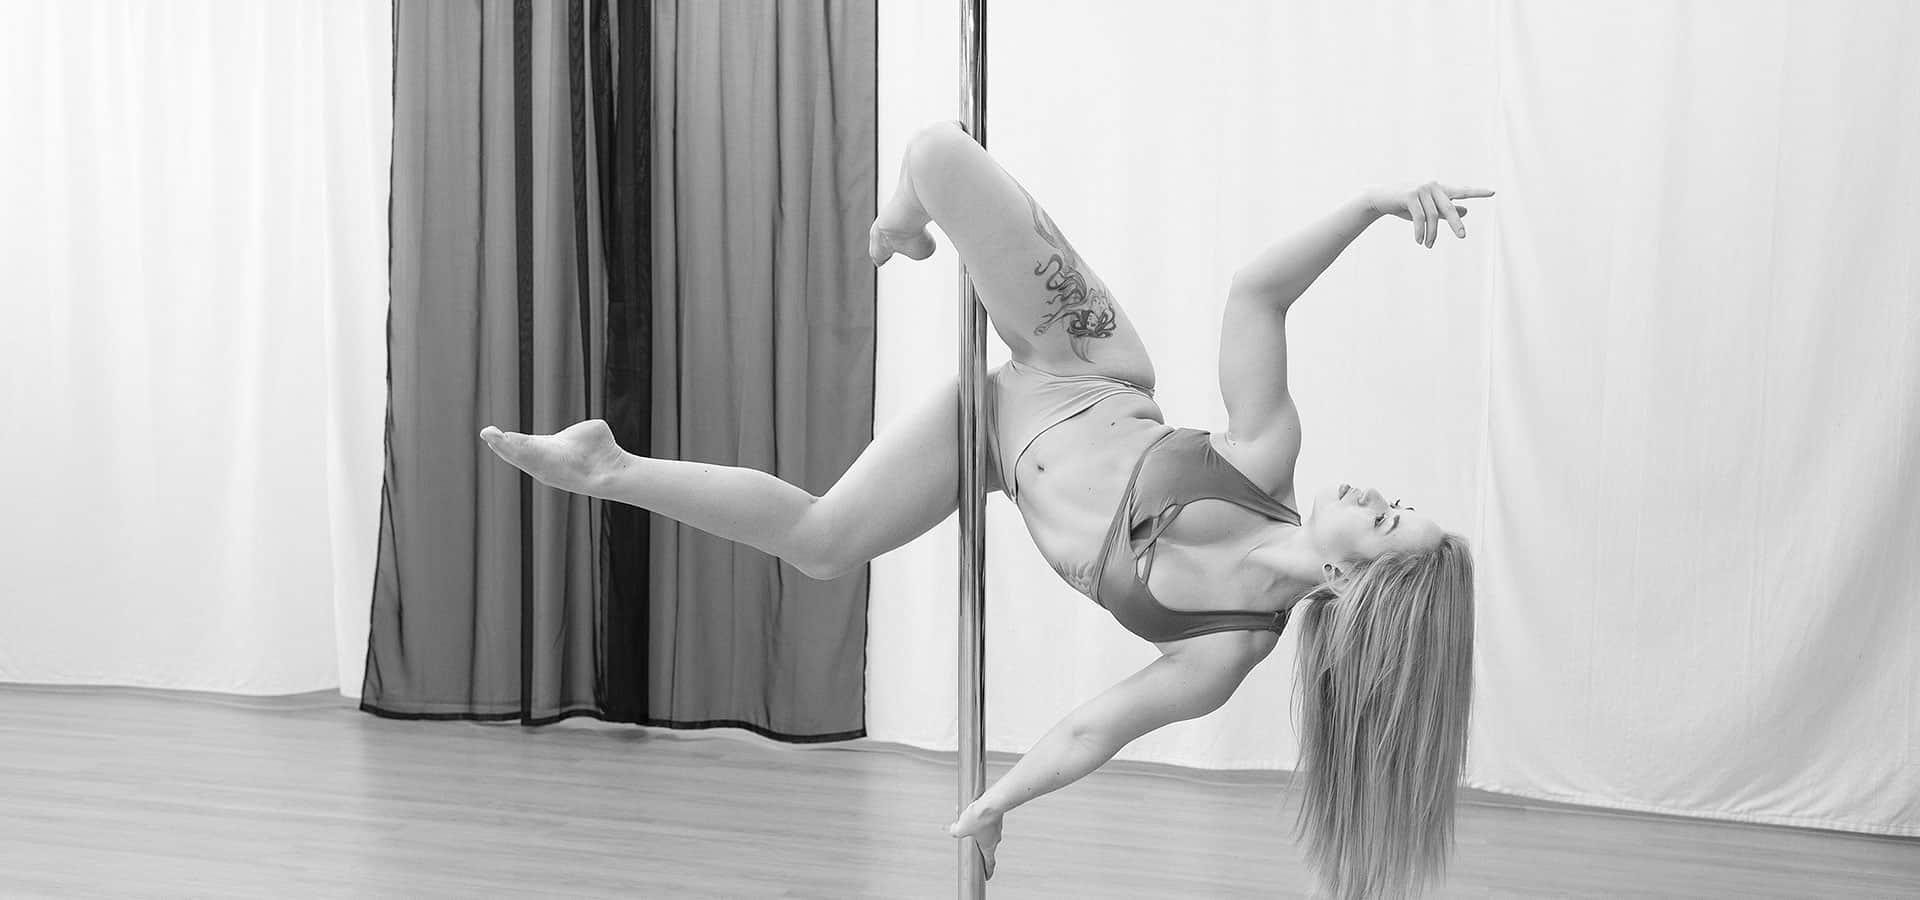 Gravity Arts poledance pose